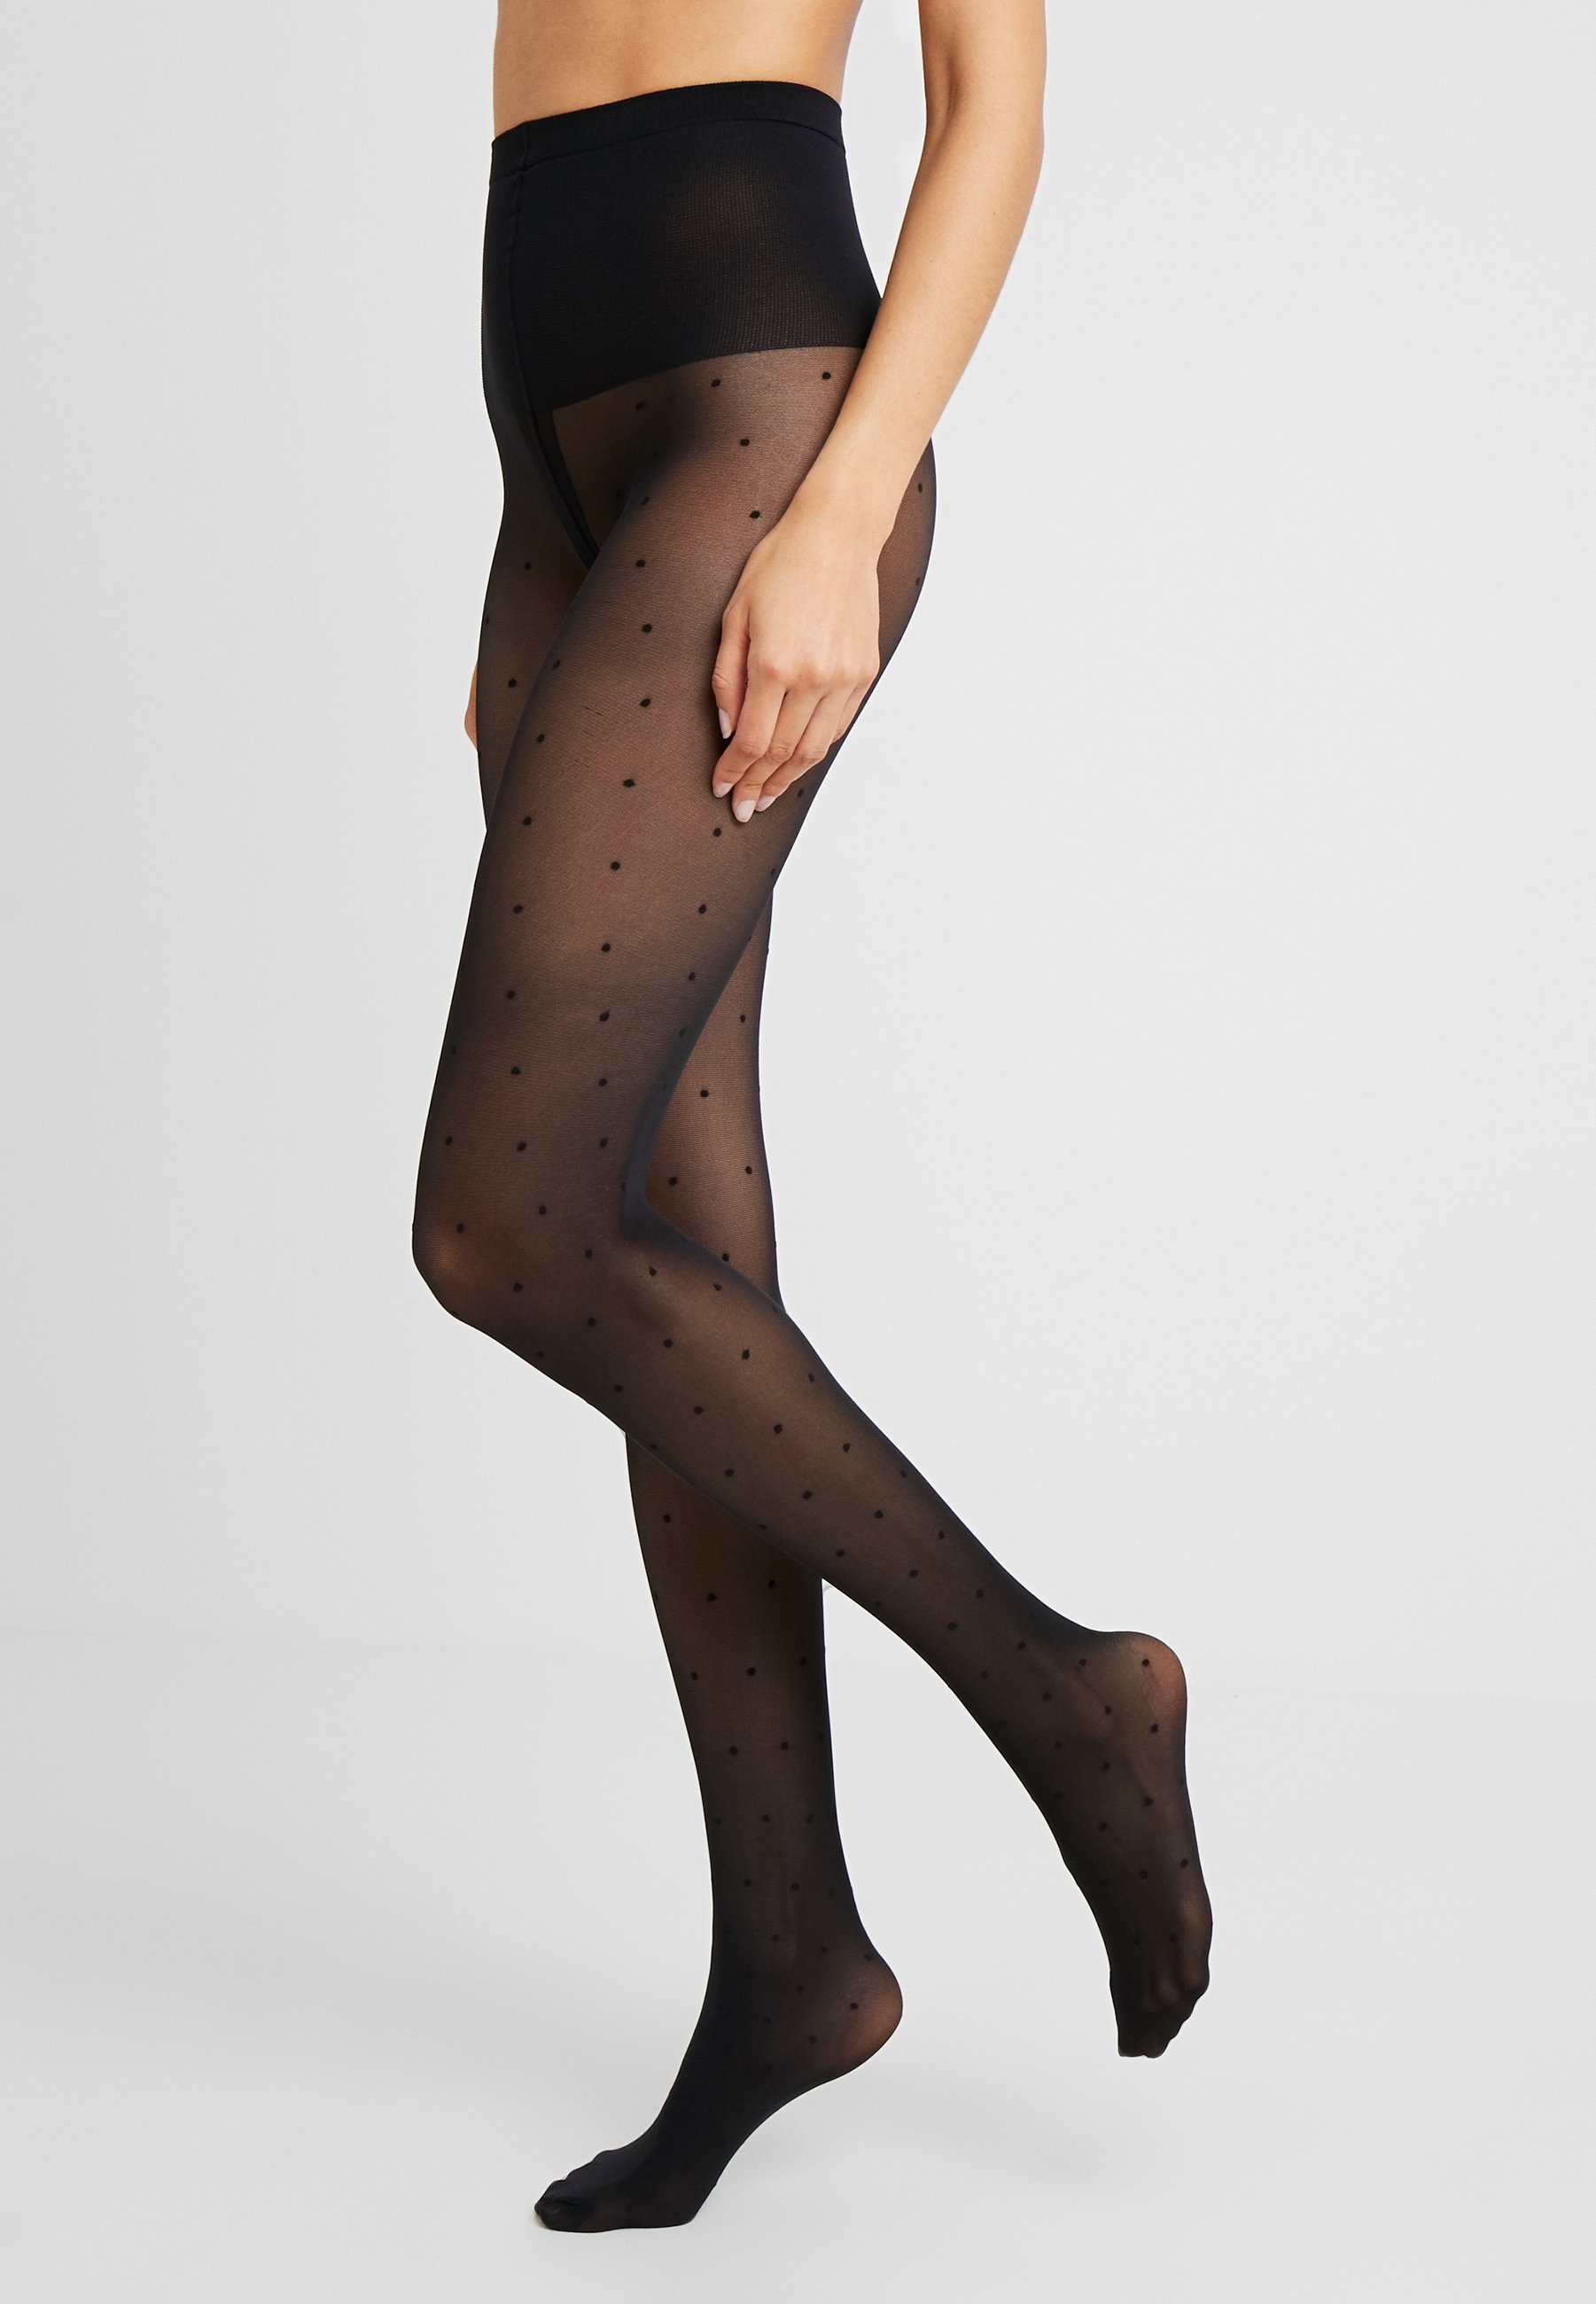 Femme DORIS DOTS 40 DEN - Collants